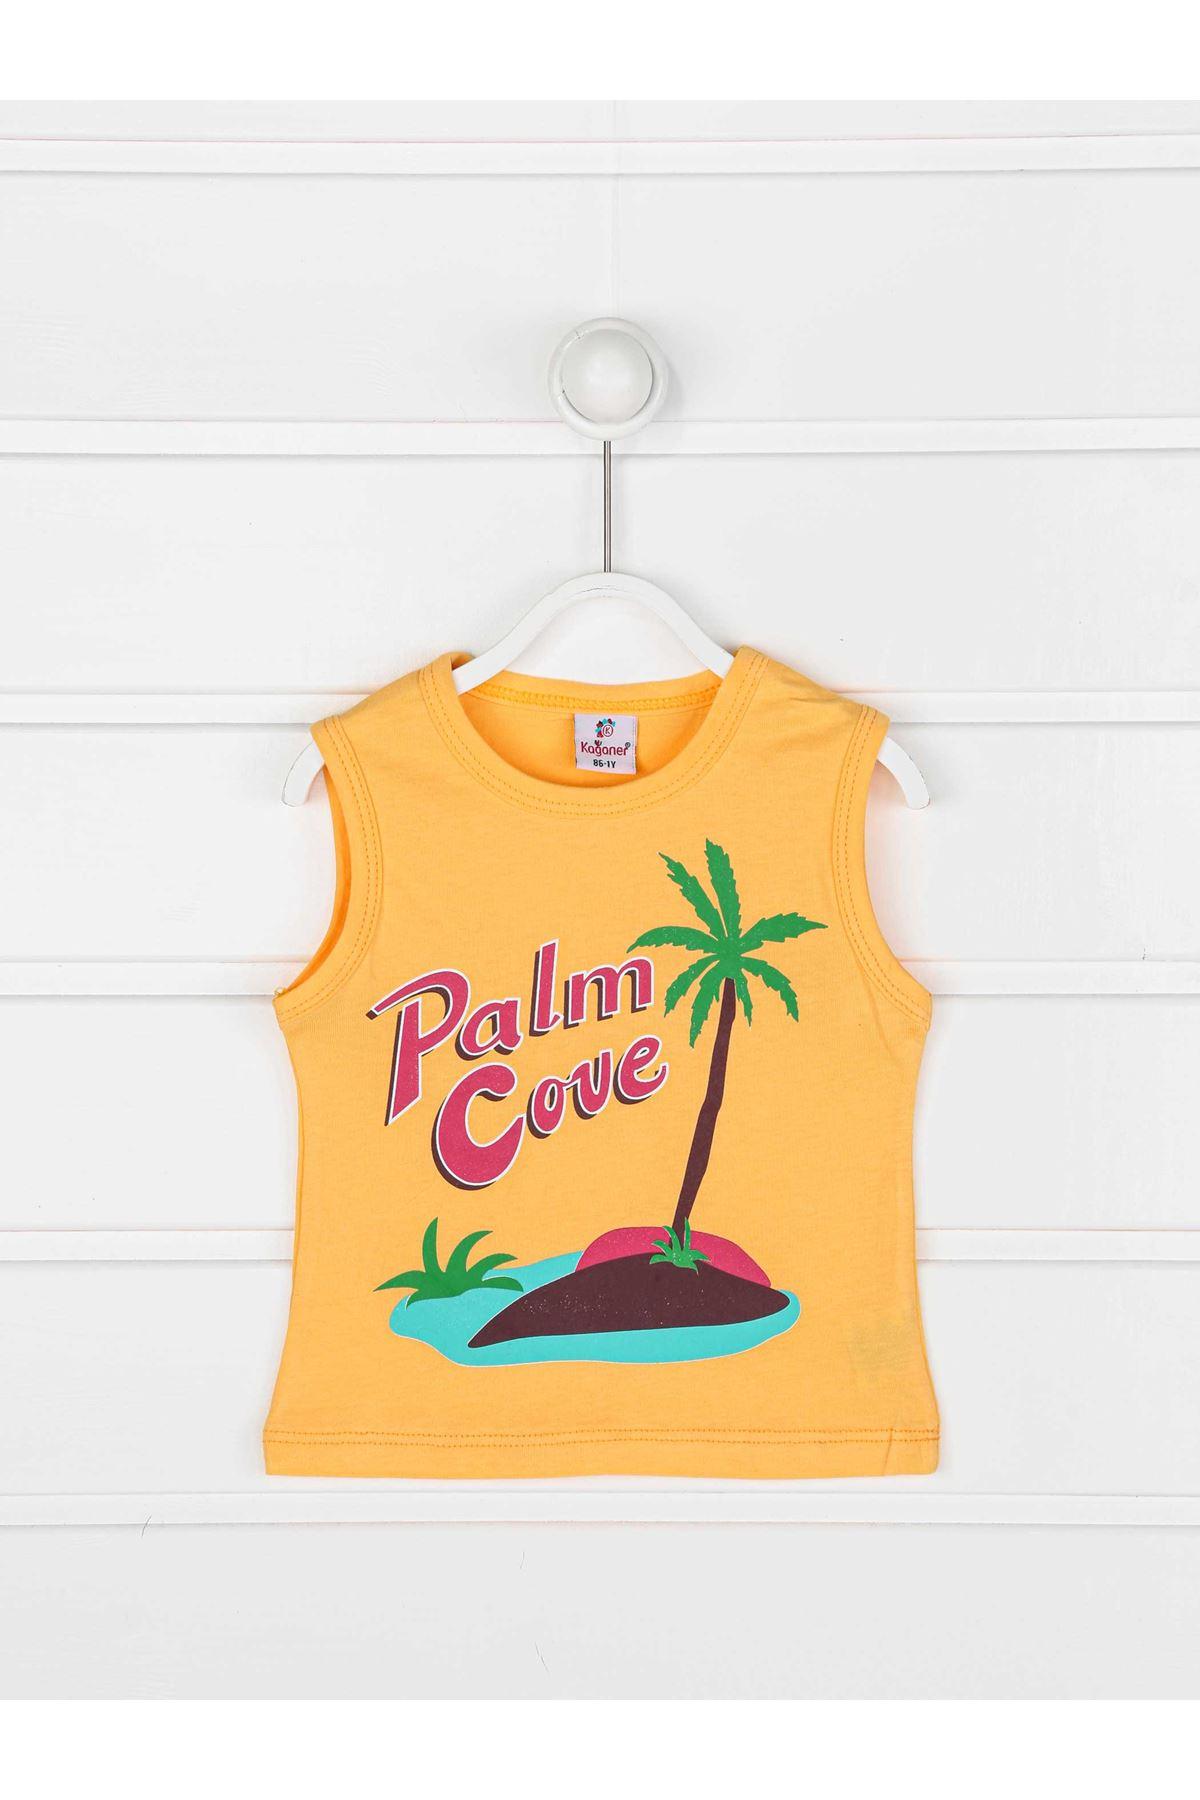 Orange Summer Male Child 2 Piece Suit